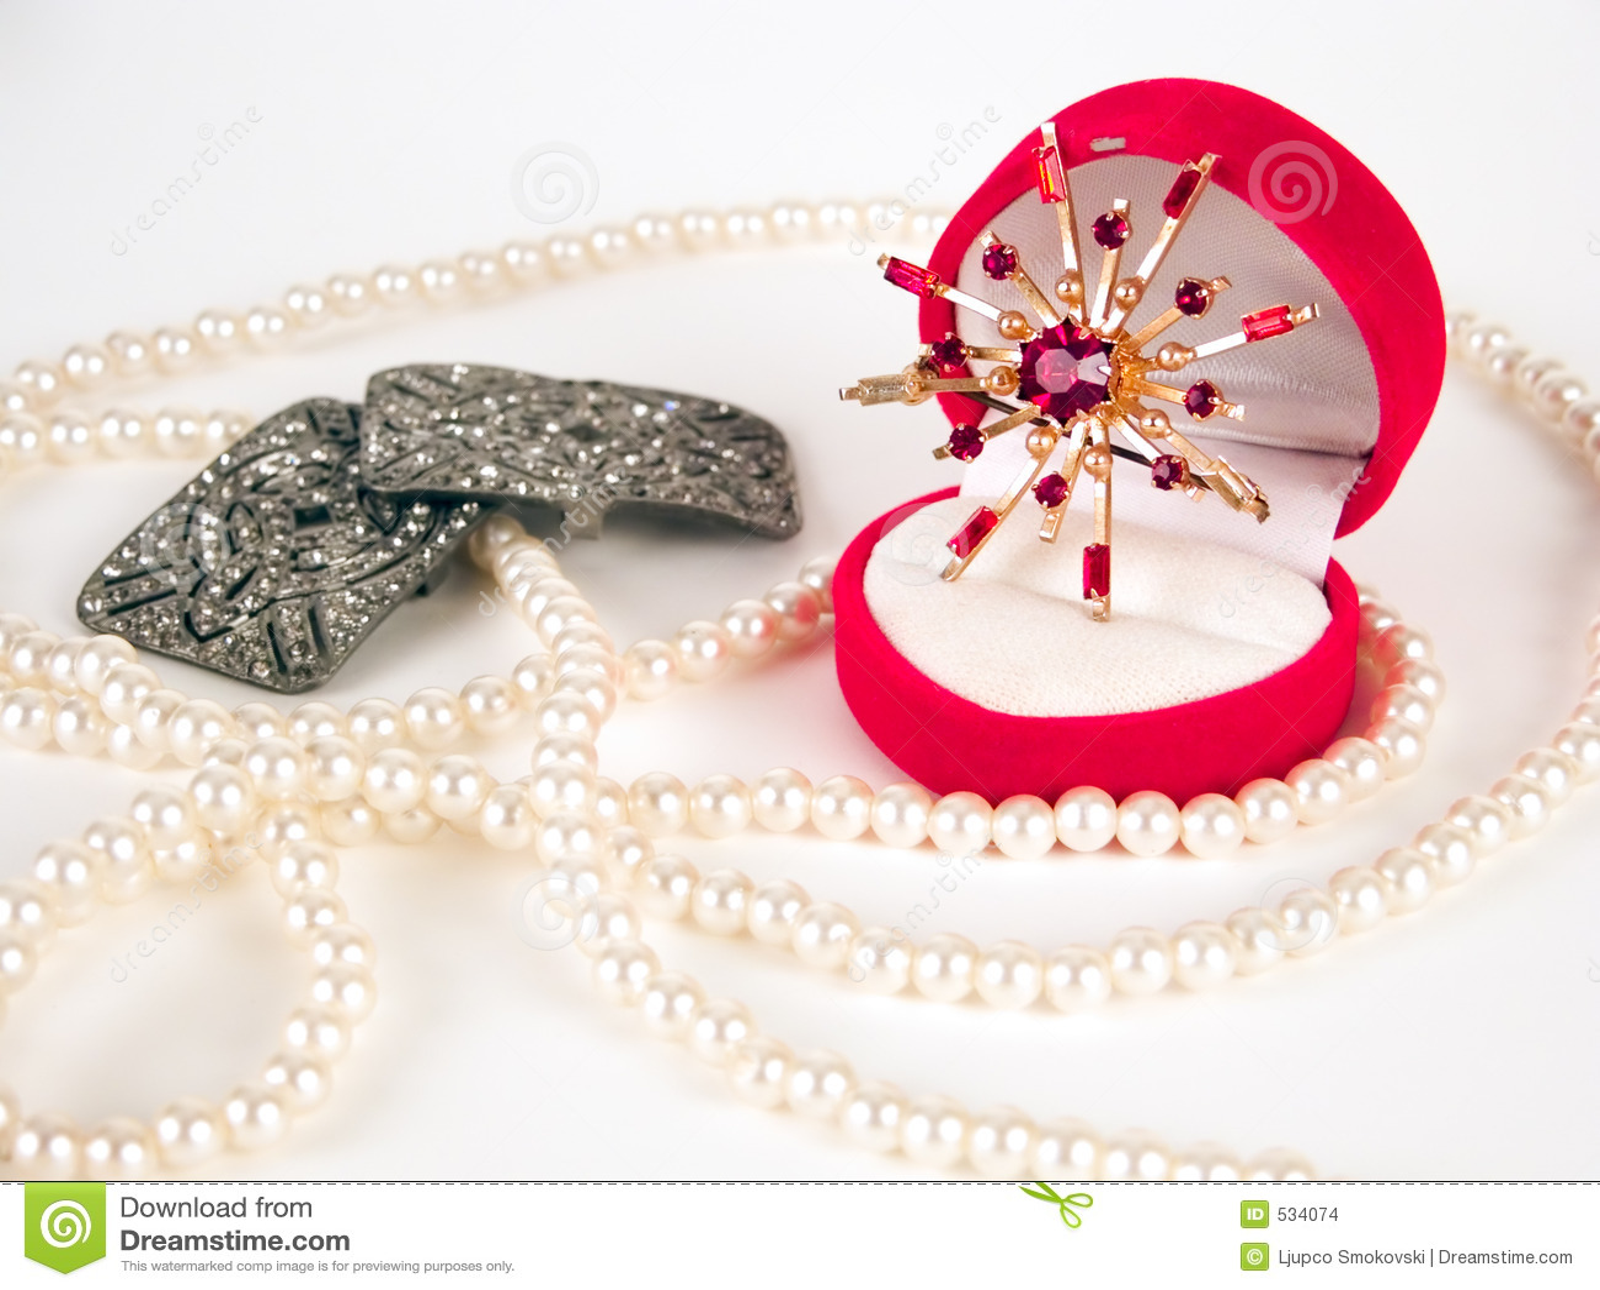 Download 别针消耗大的珍珠环形 库存照片. 图片 包括有 豪华, 链子, 项链, 订婚, 建议, beautifuler - 534074